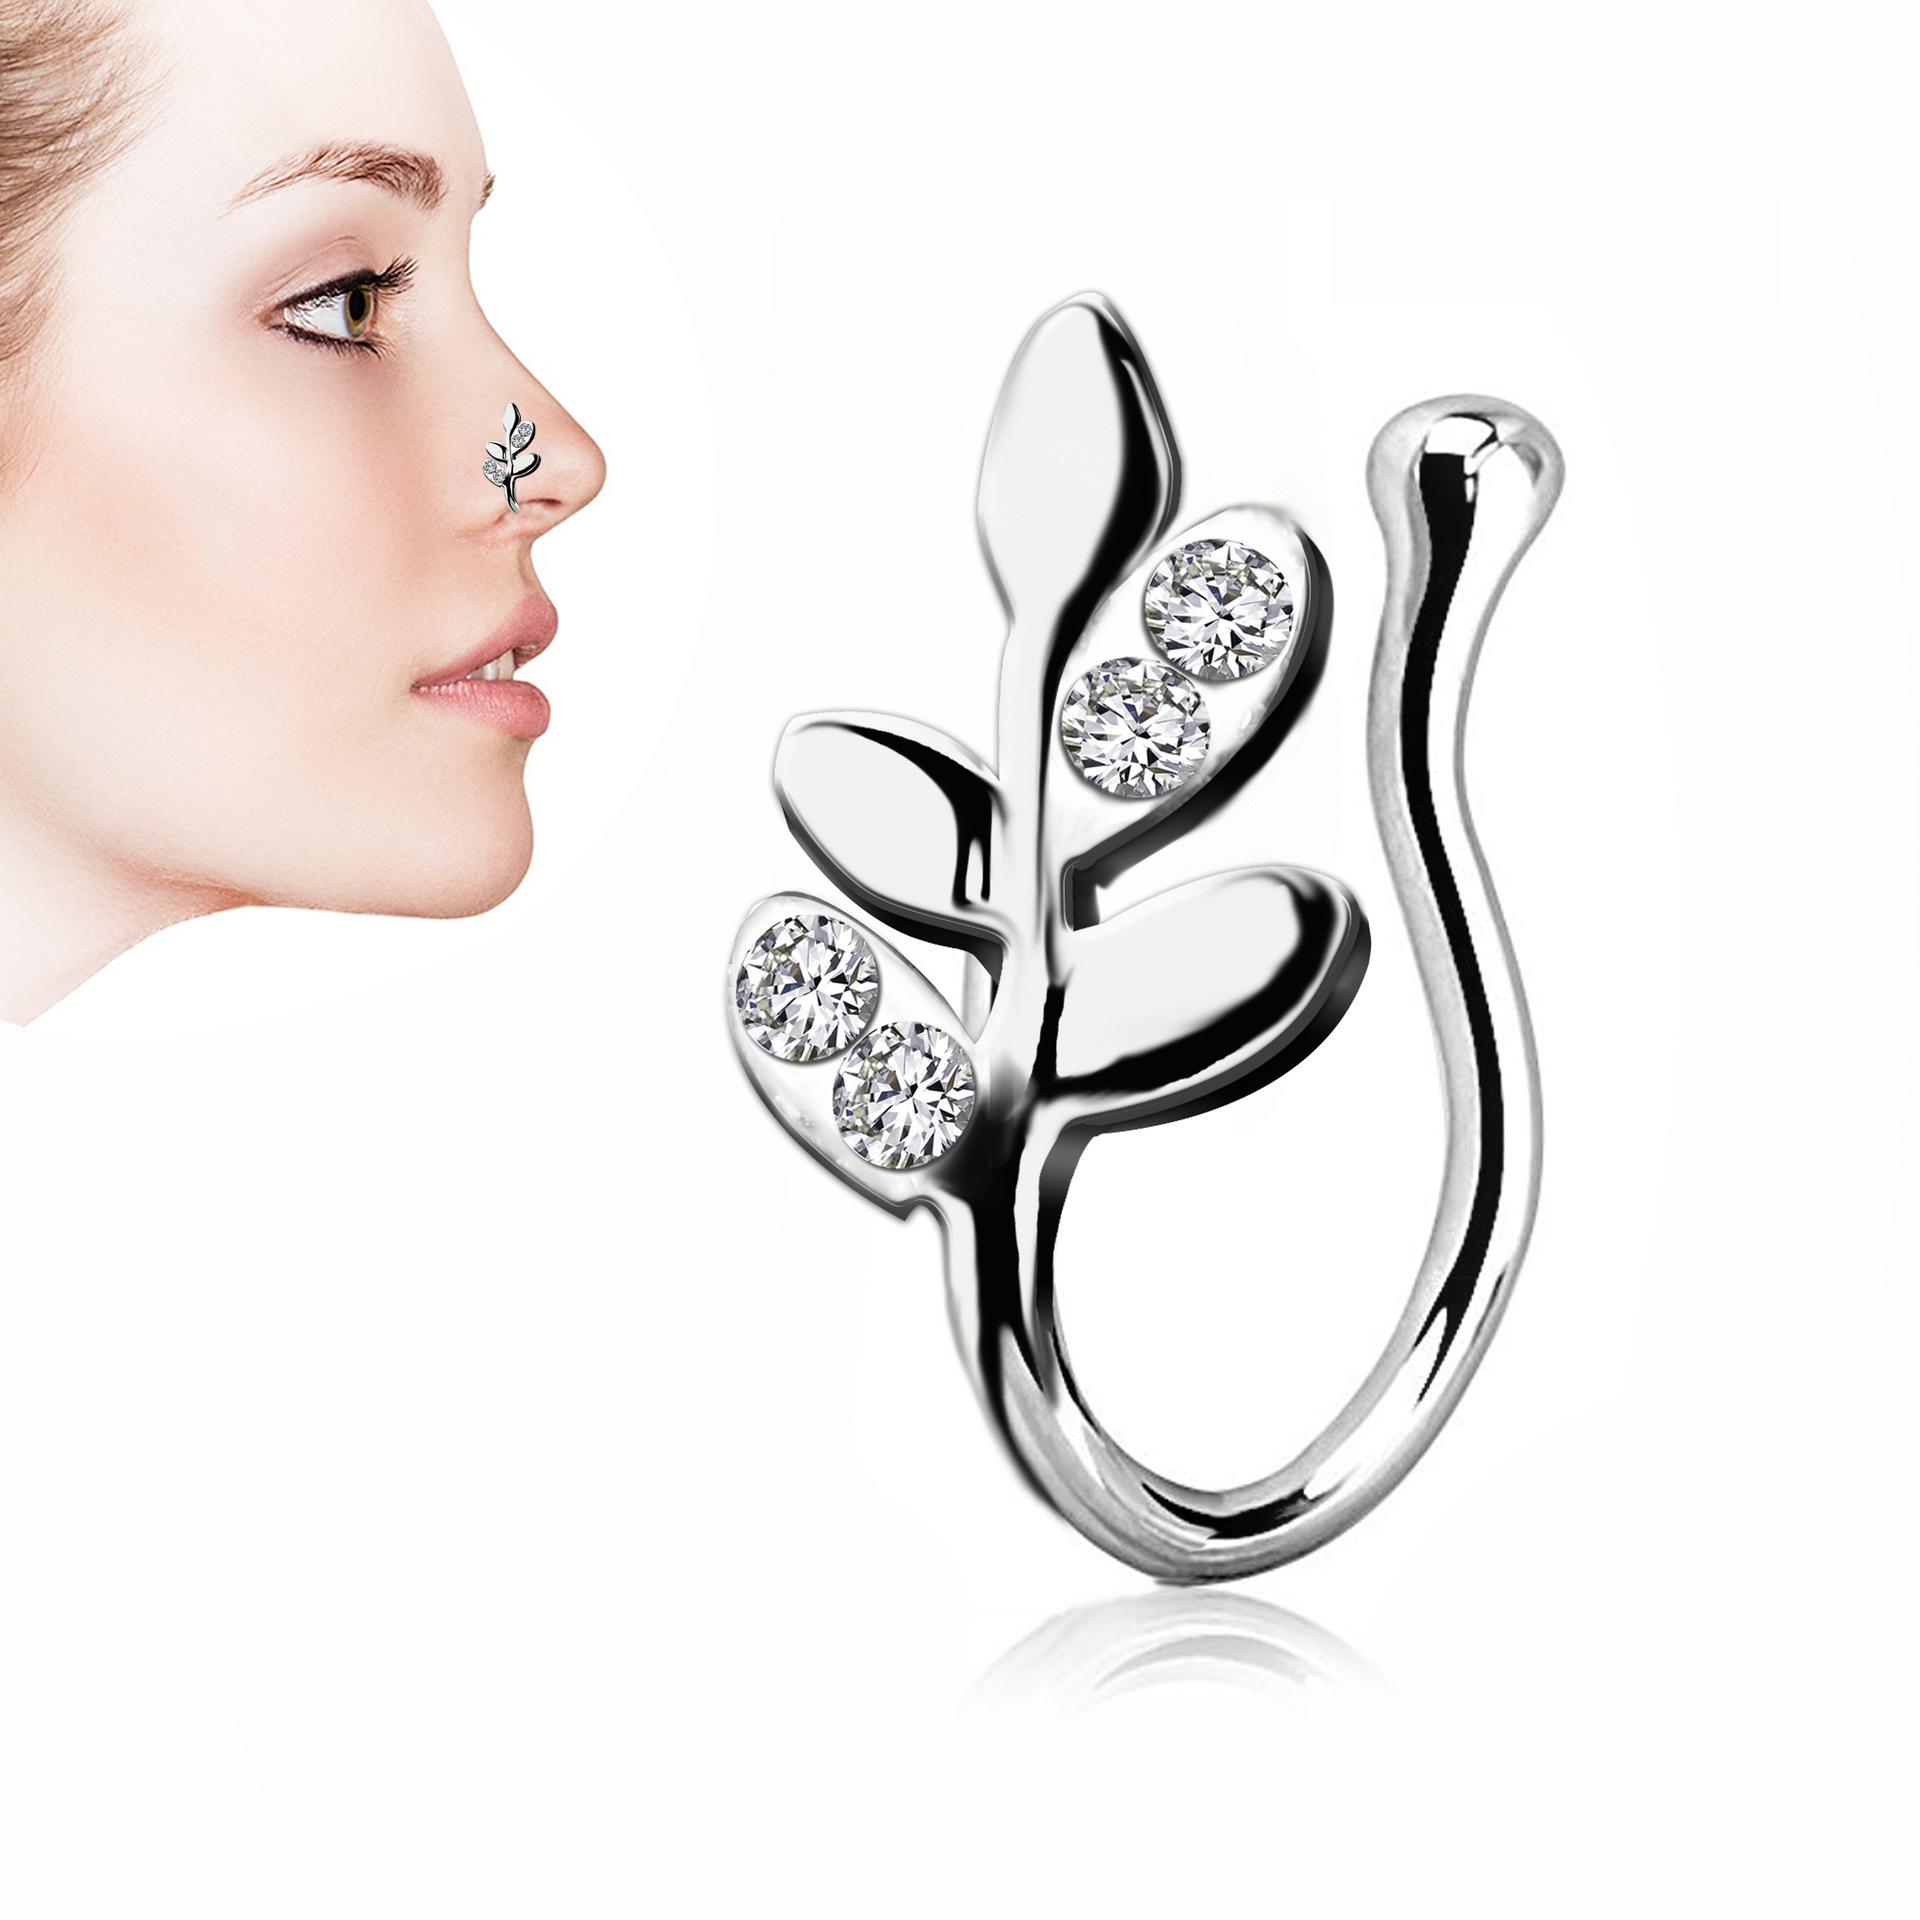 Elegant Decorative Leaf Nose Ring for Fashionable Ensembles